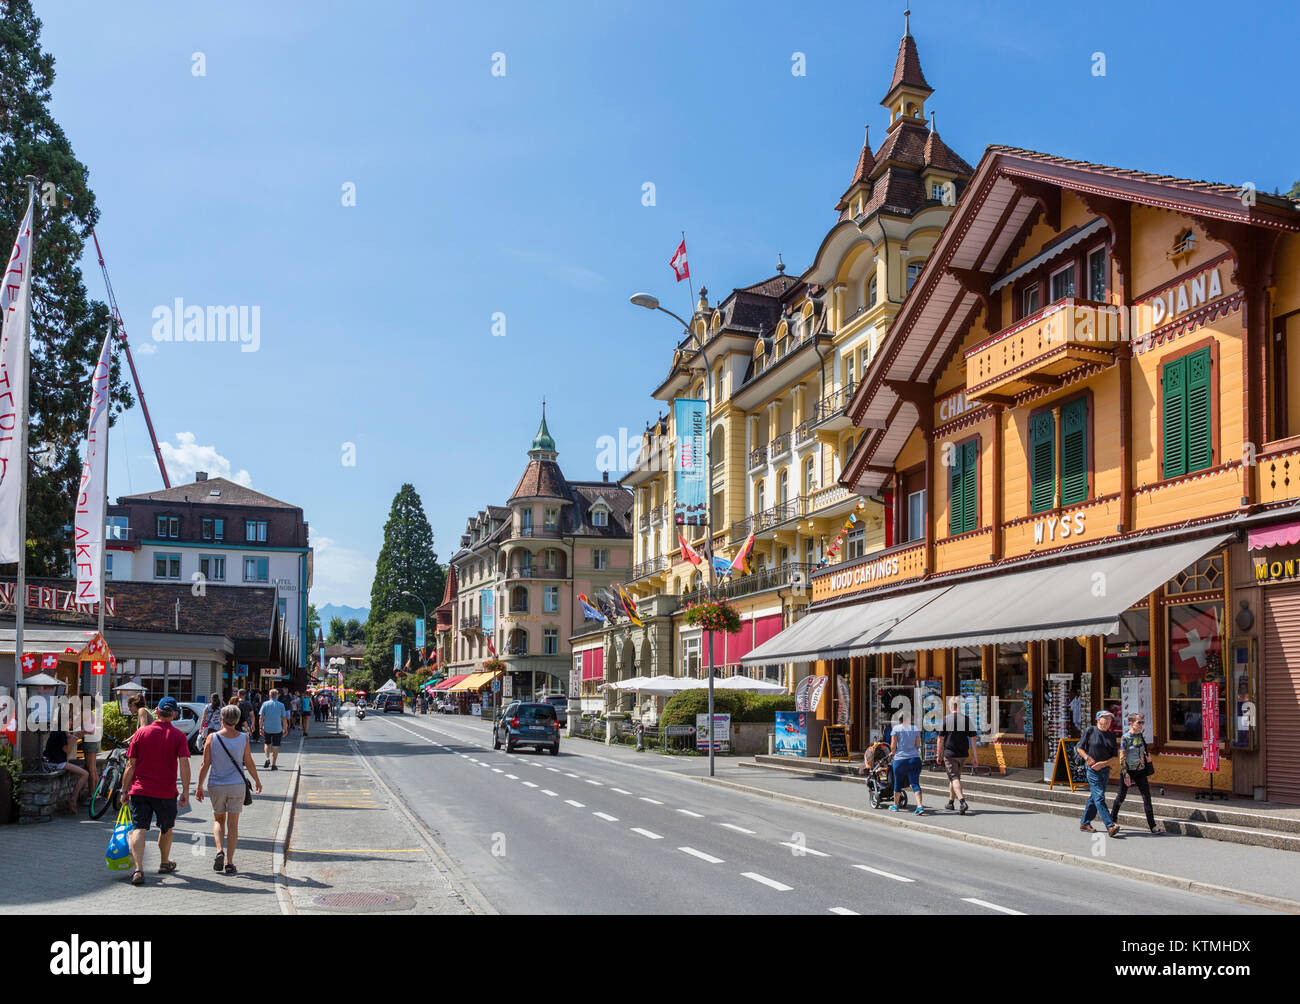 Höheweg, the main street in Interlaken, Switzerland - Stock Image